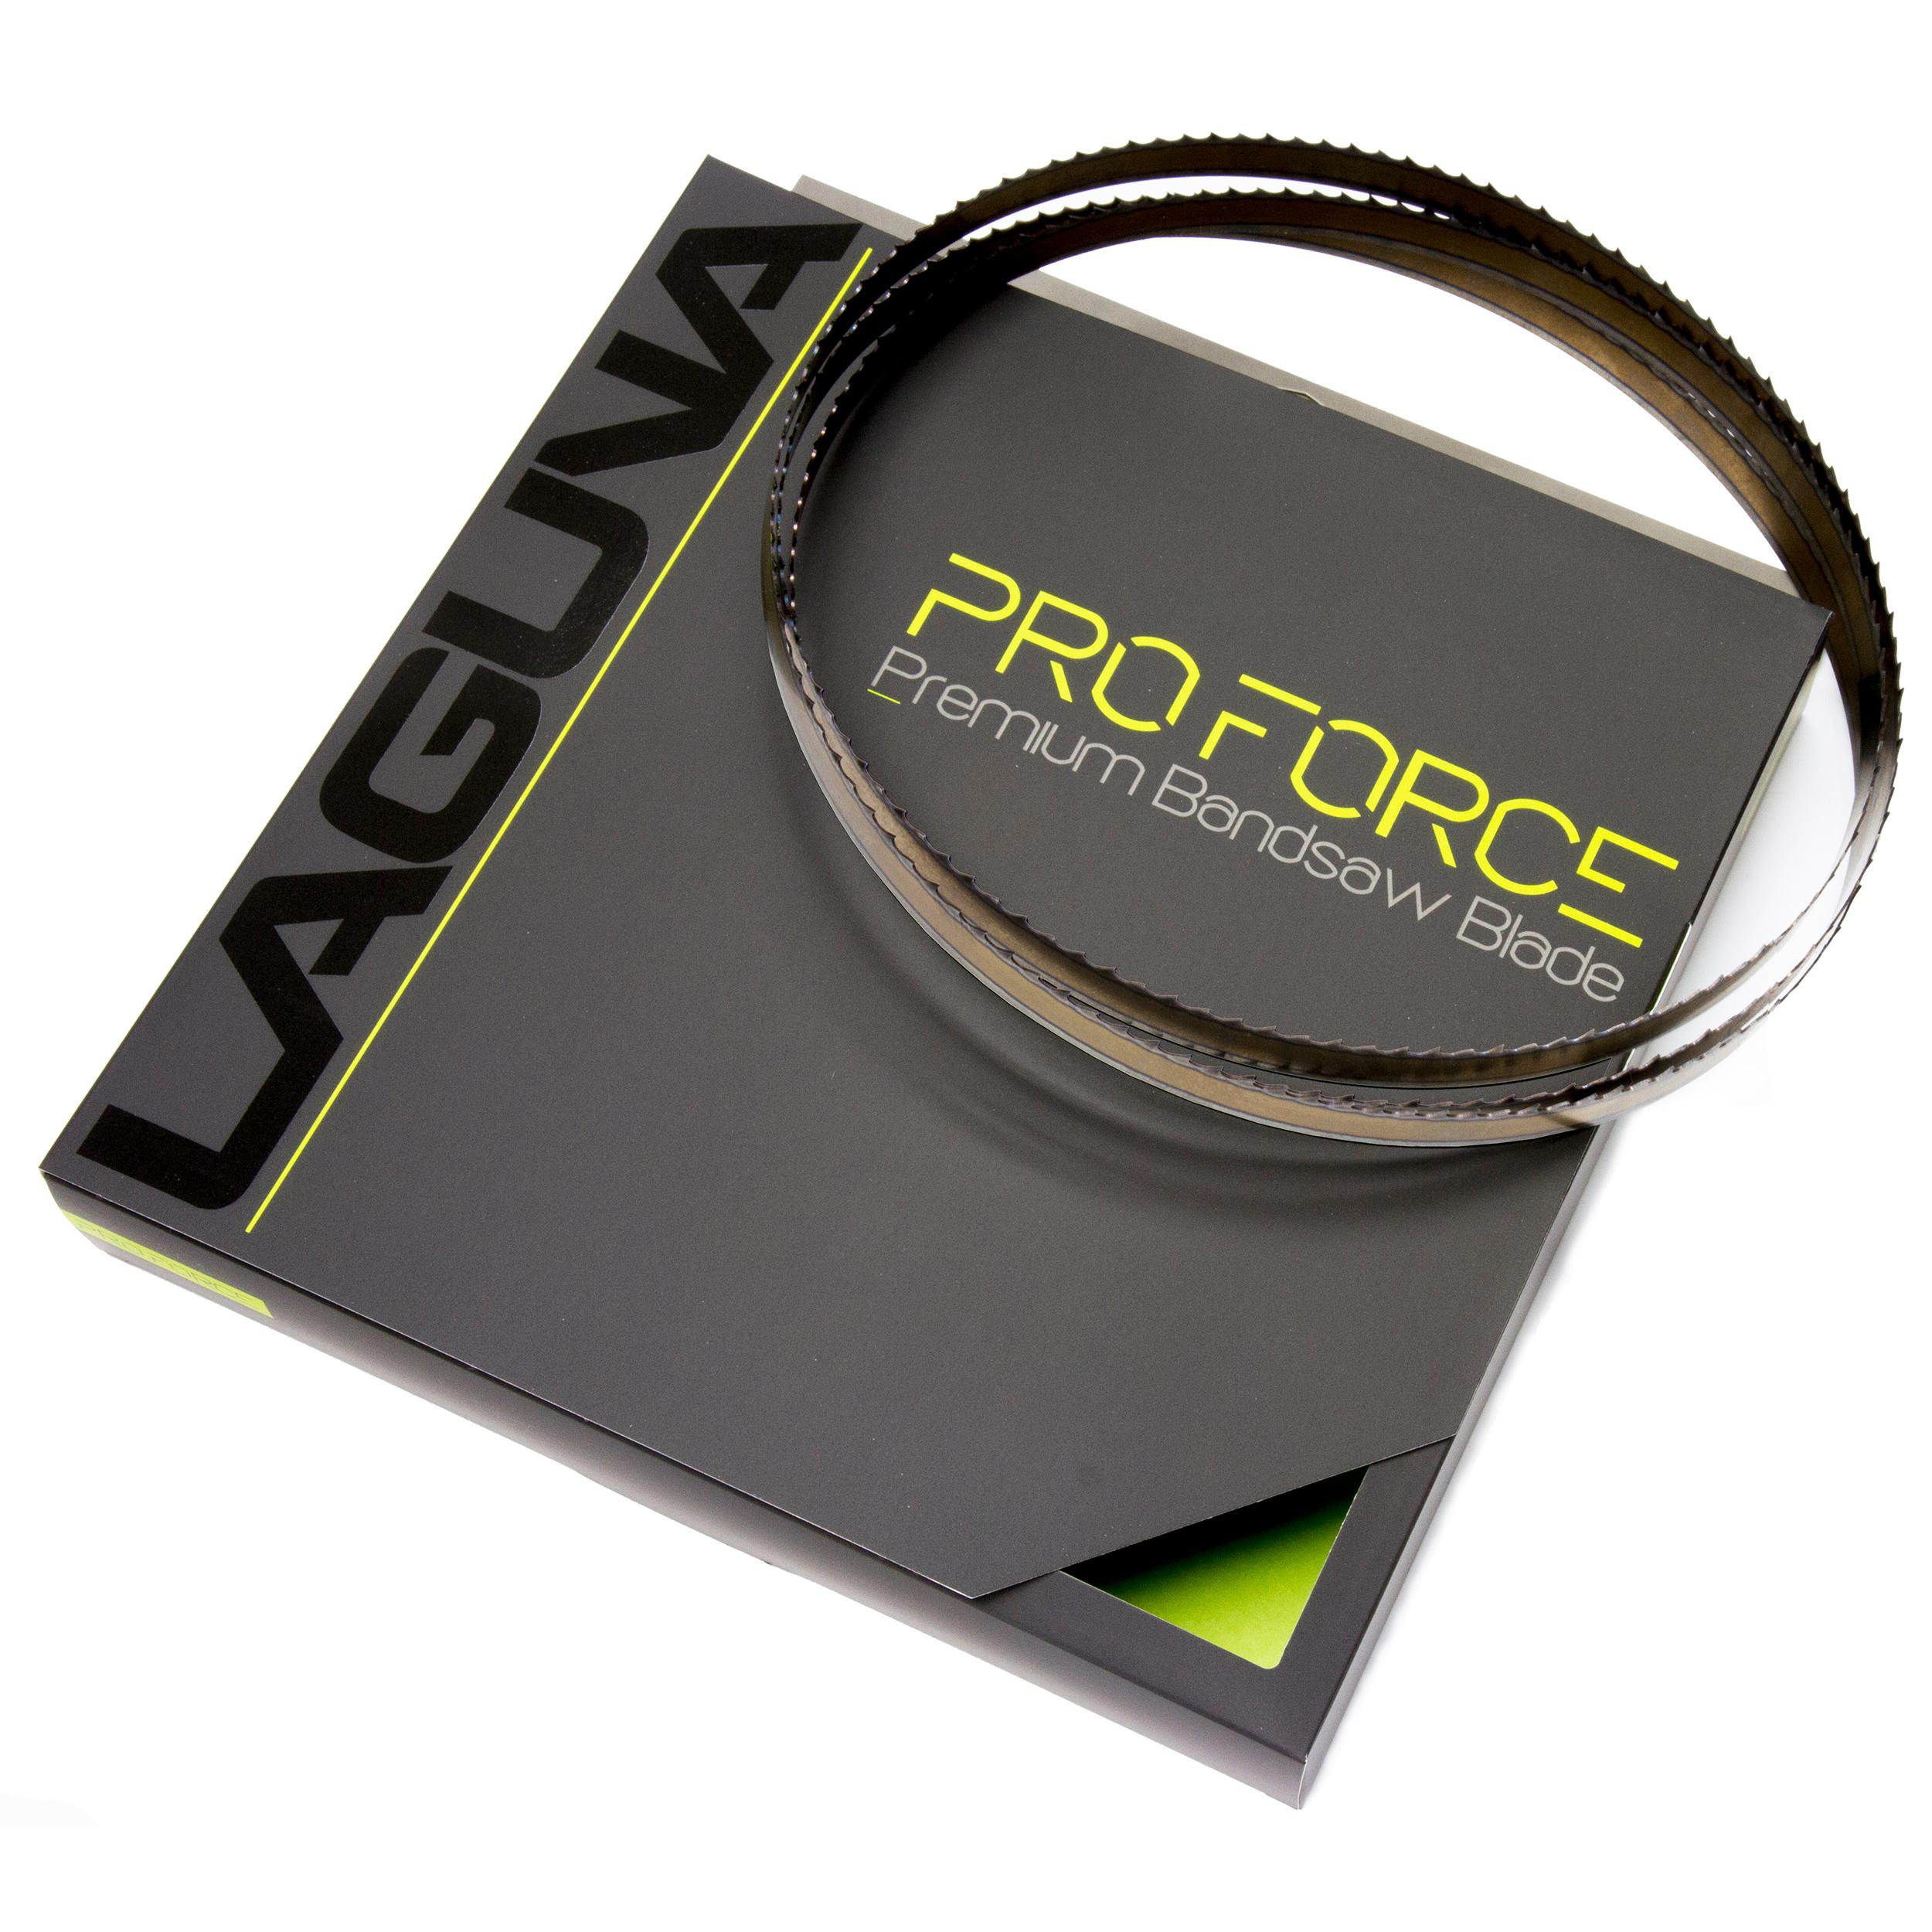 Pro Force 3 / 8